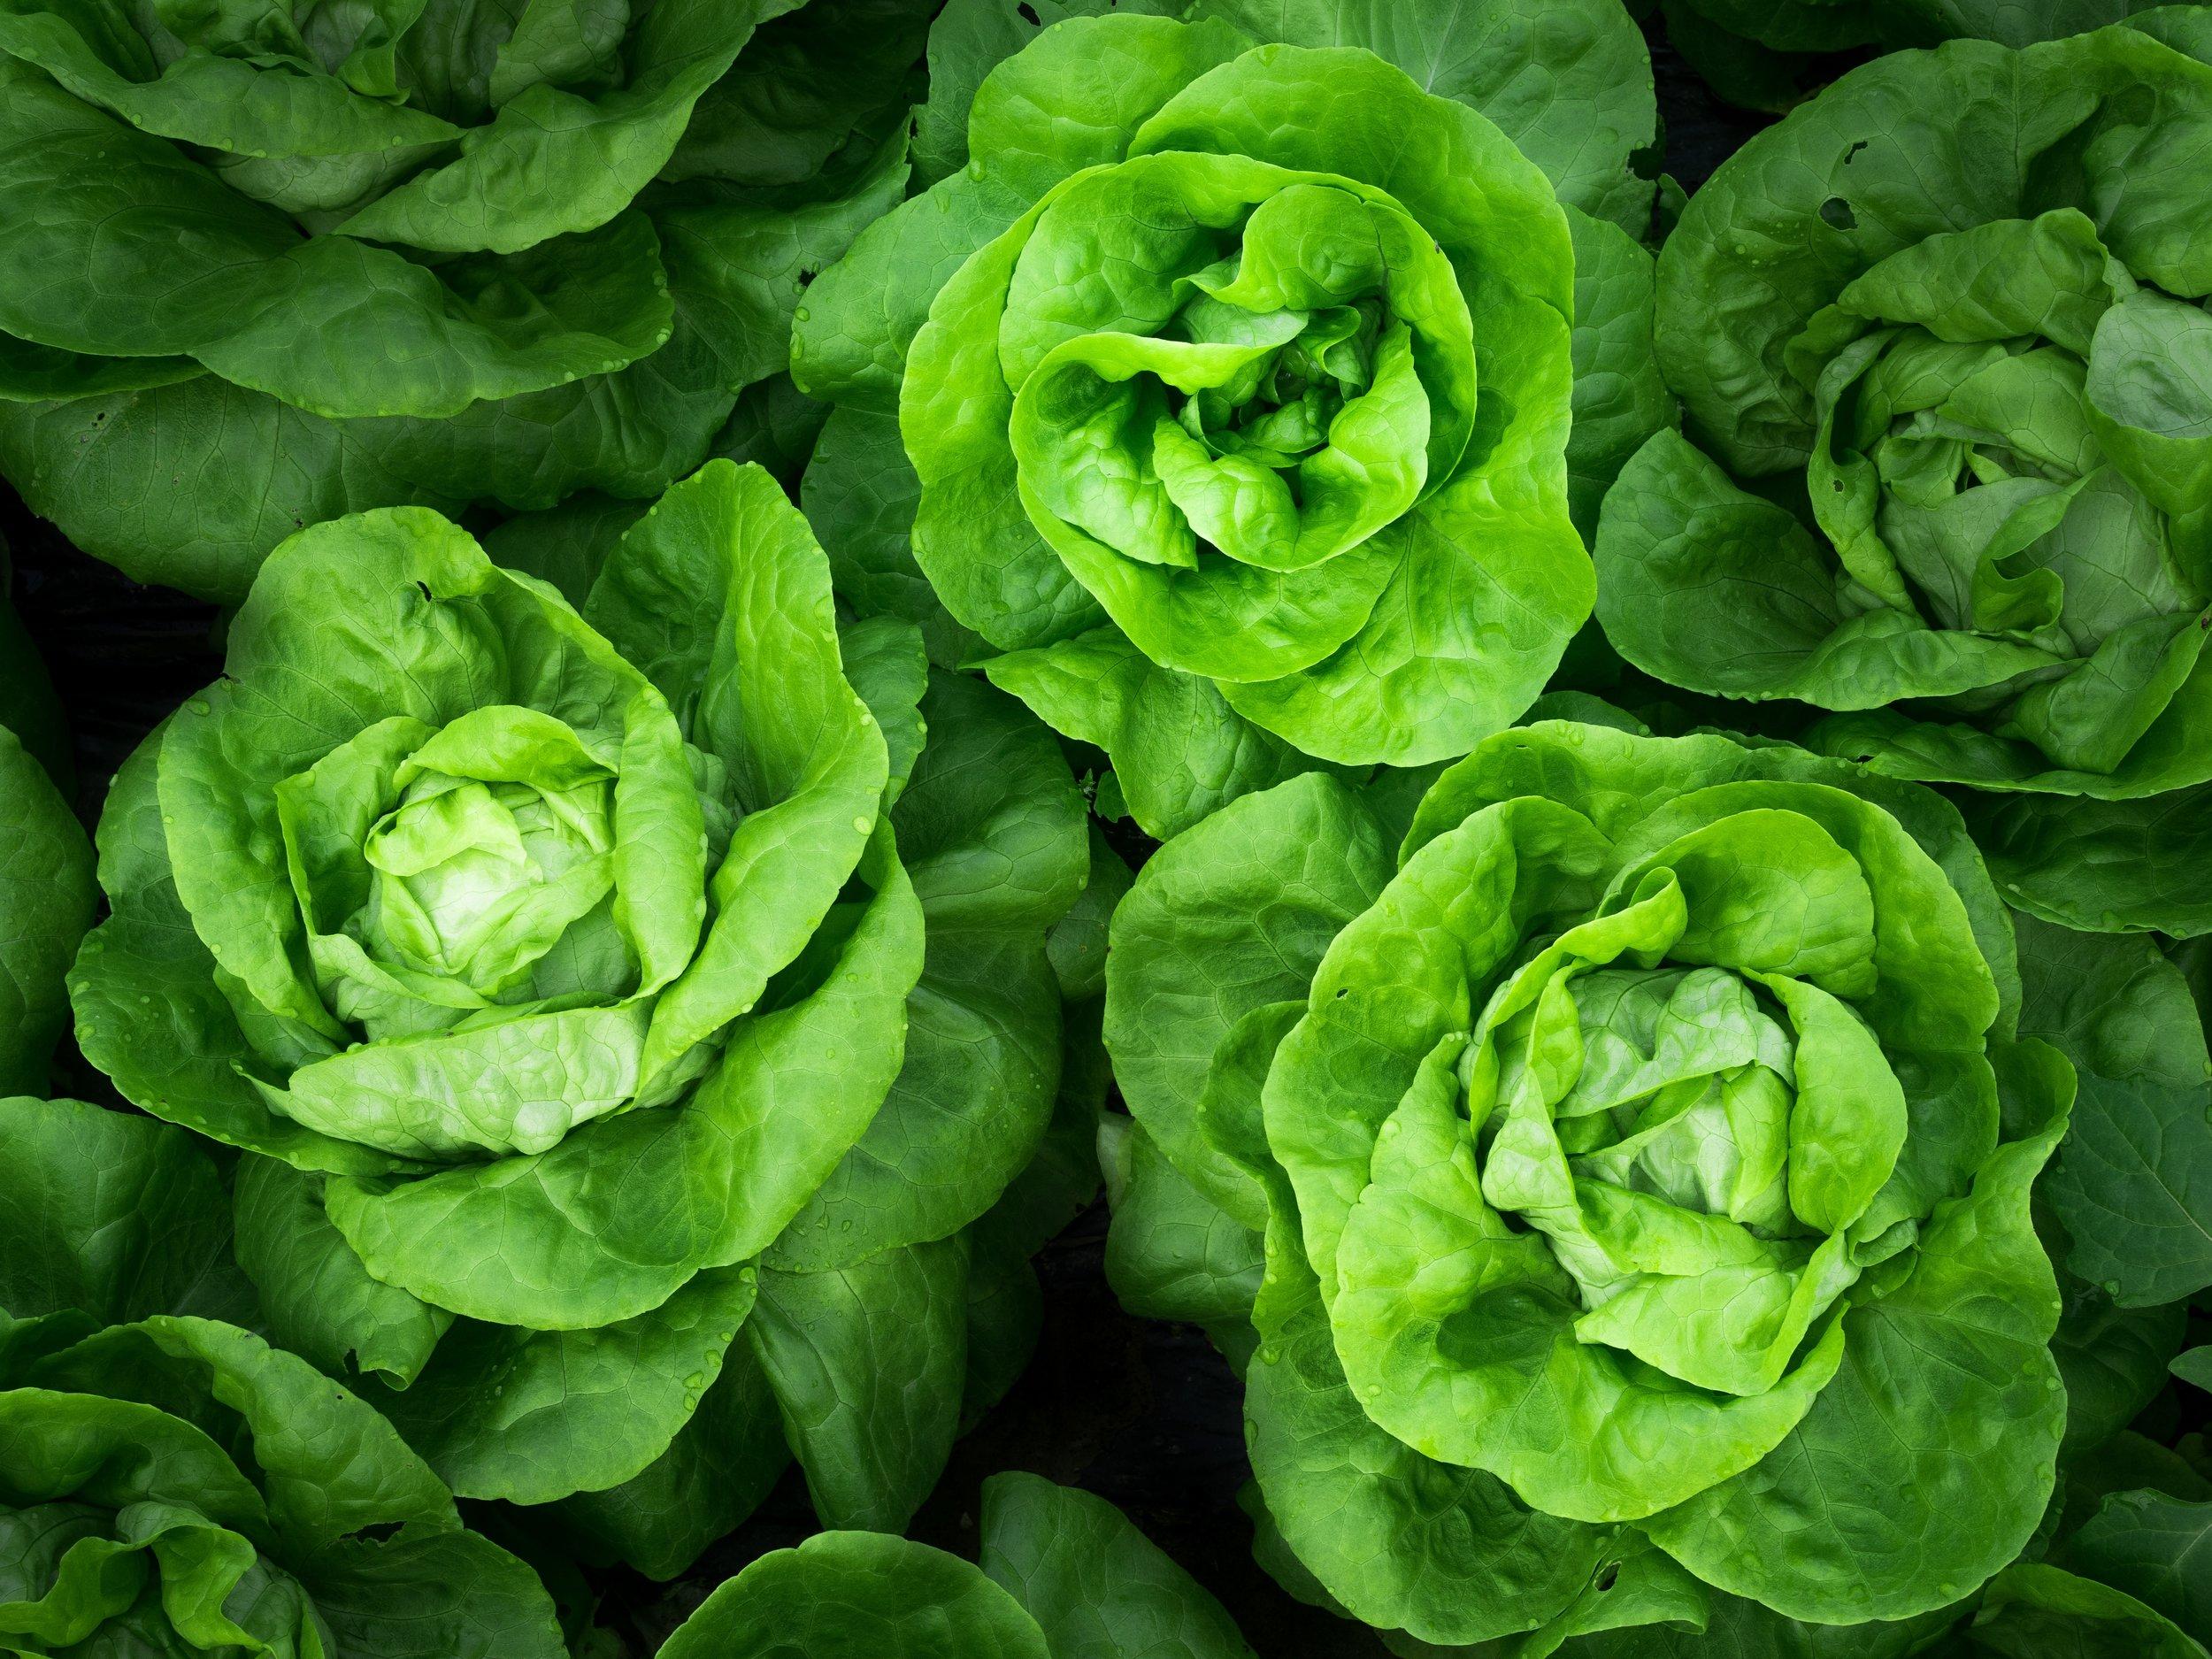 lettuce - June salad